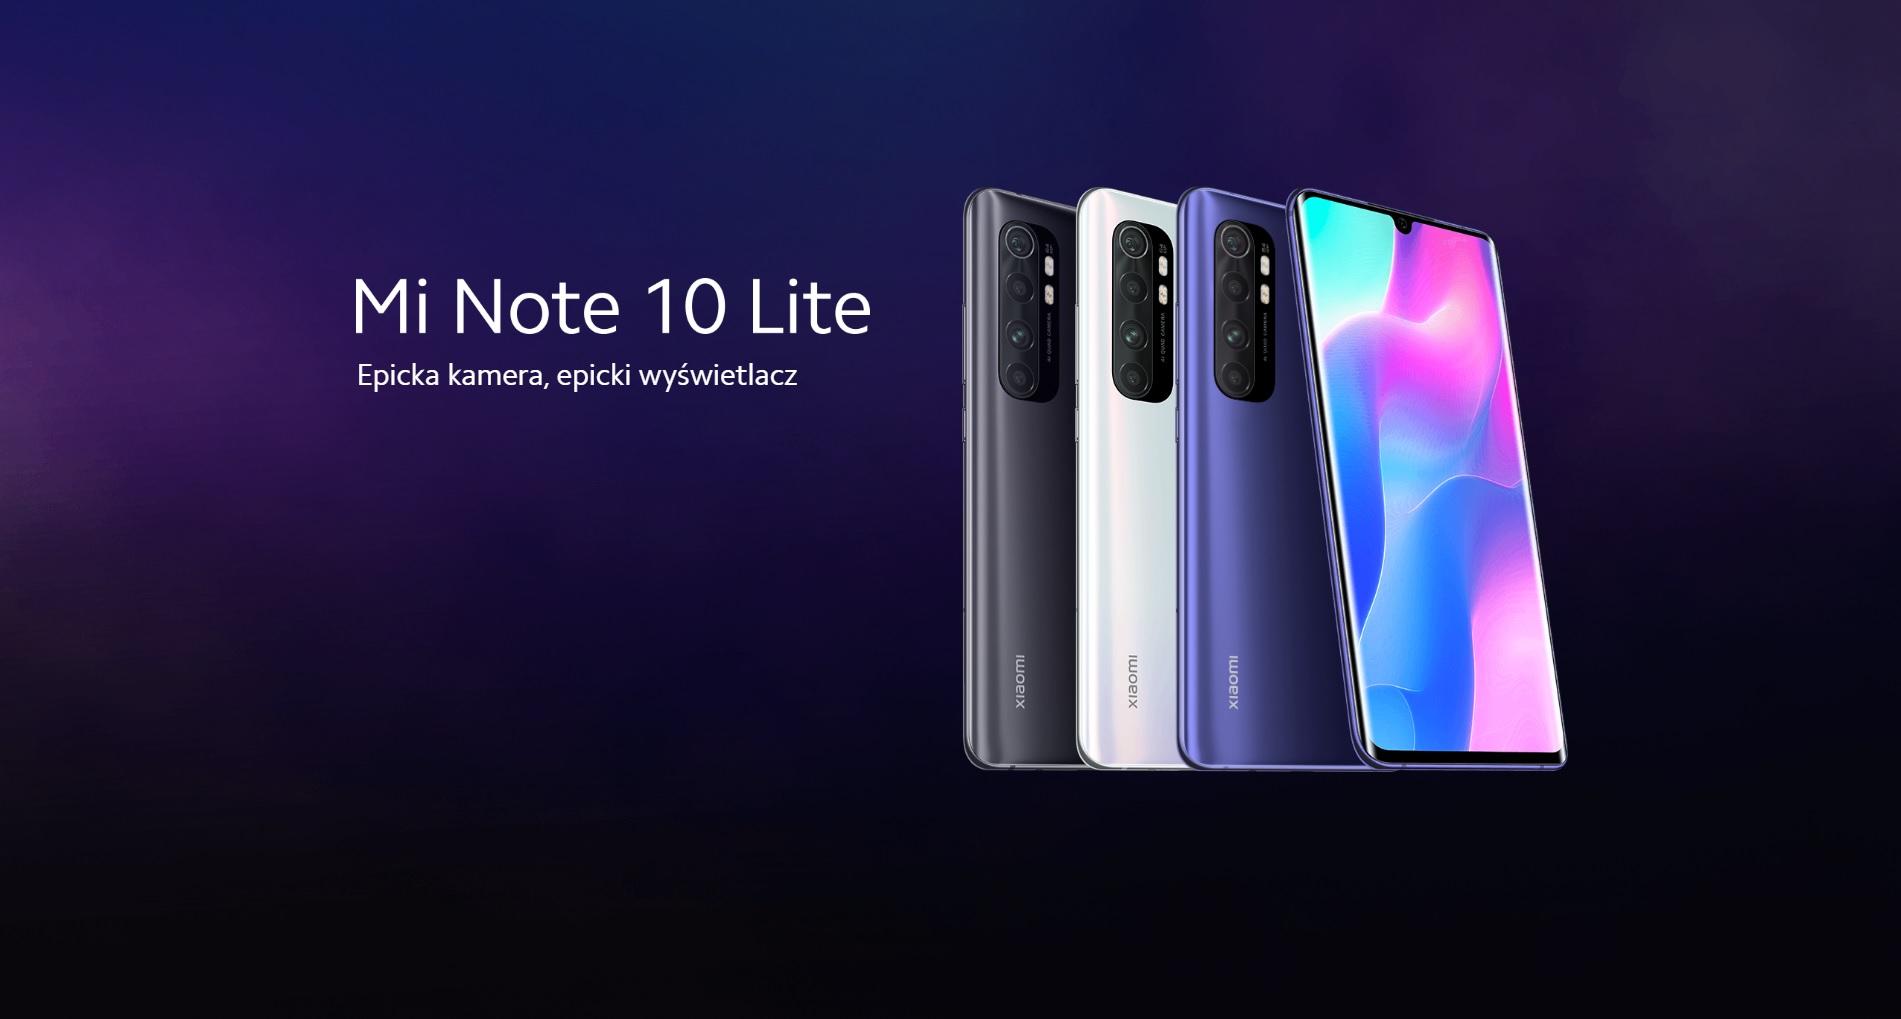 smartfon Xiaomi Mi Note 10 Lite smartphone